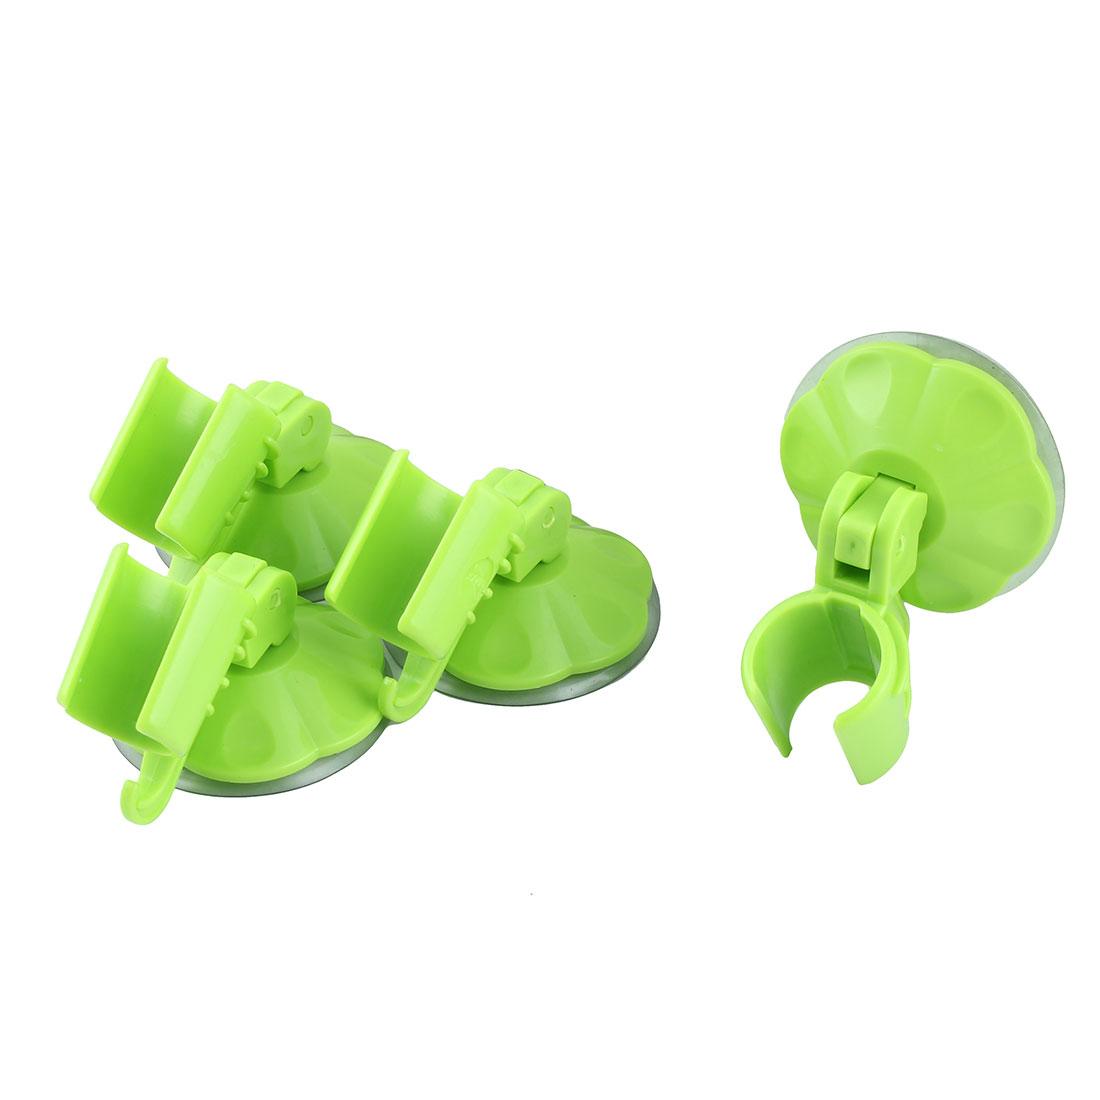 Apartment Plastic Sucker Wall Mounted Adjustable Shower Head Holder Green 4pcs